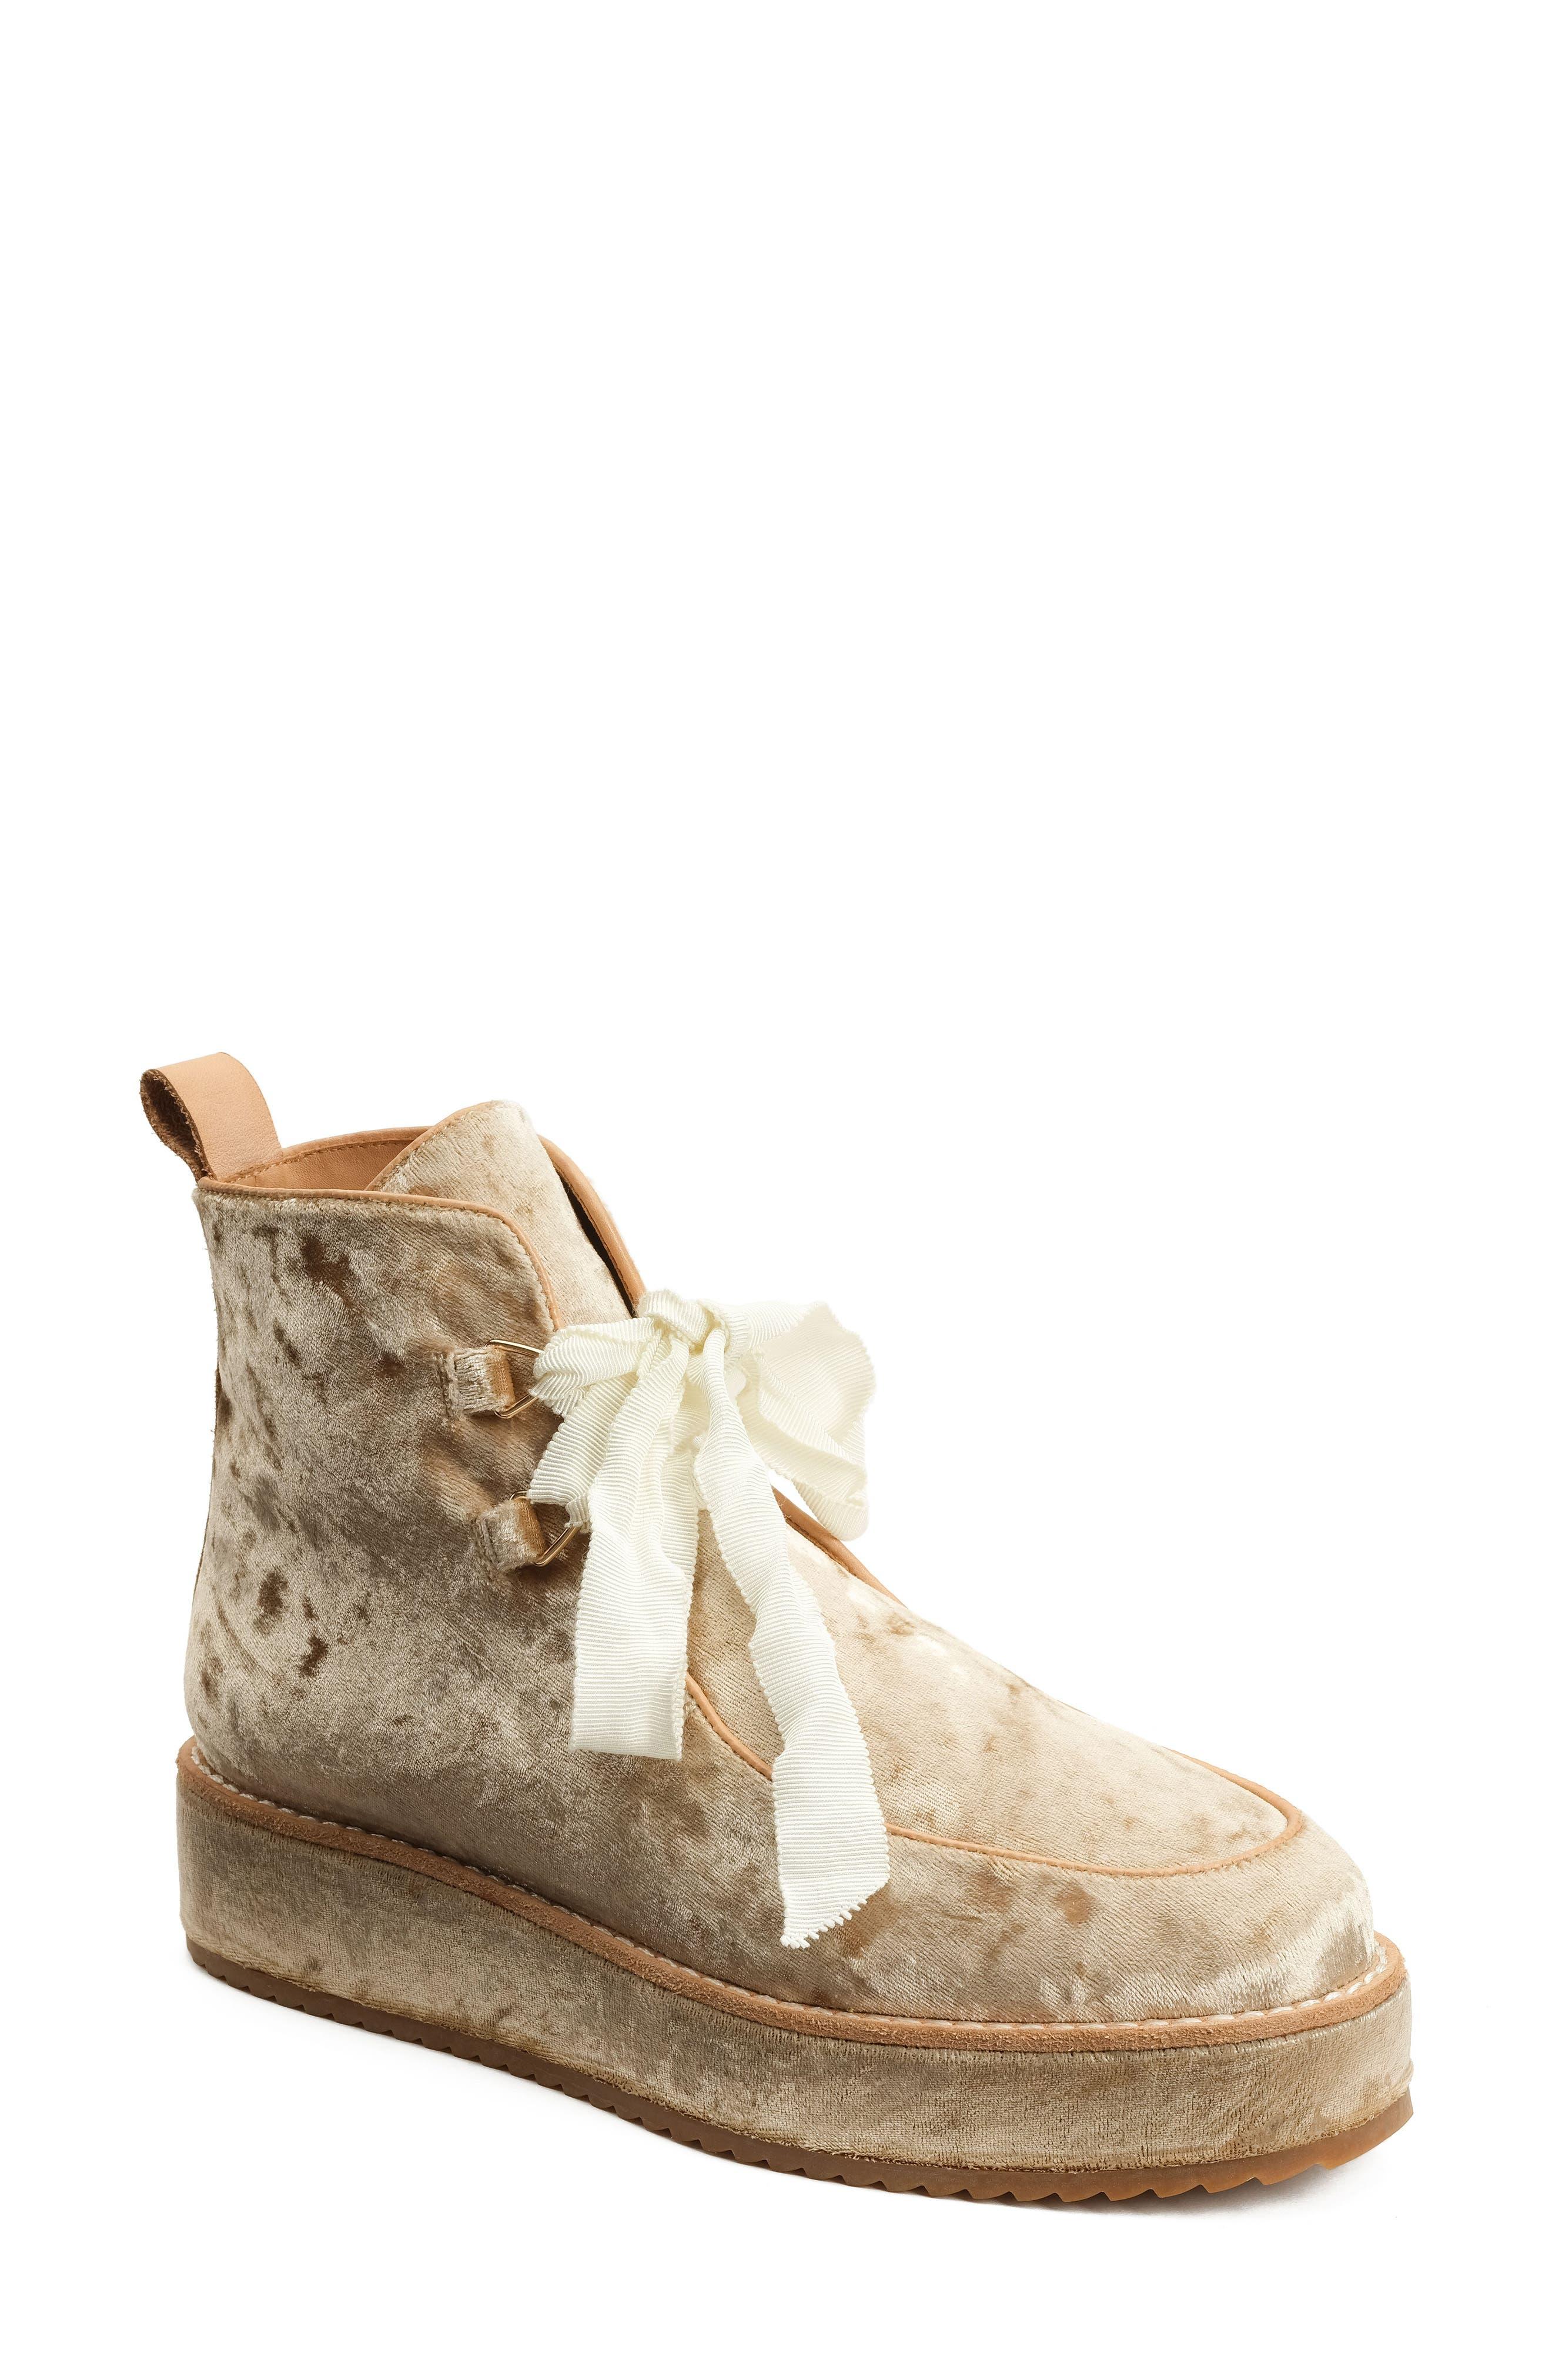 Penny Sutton Chukka Boot,                         Main,                         color, 272